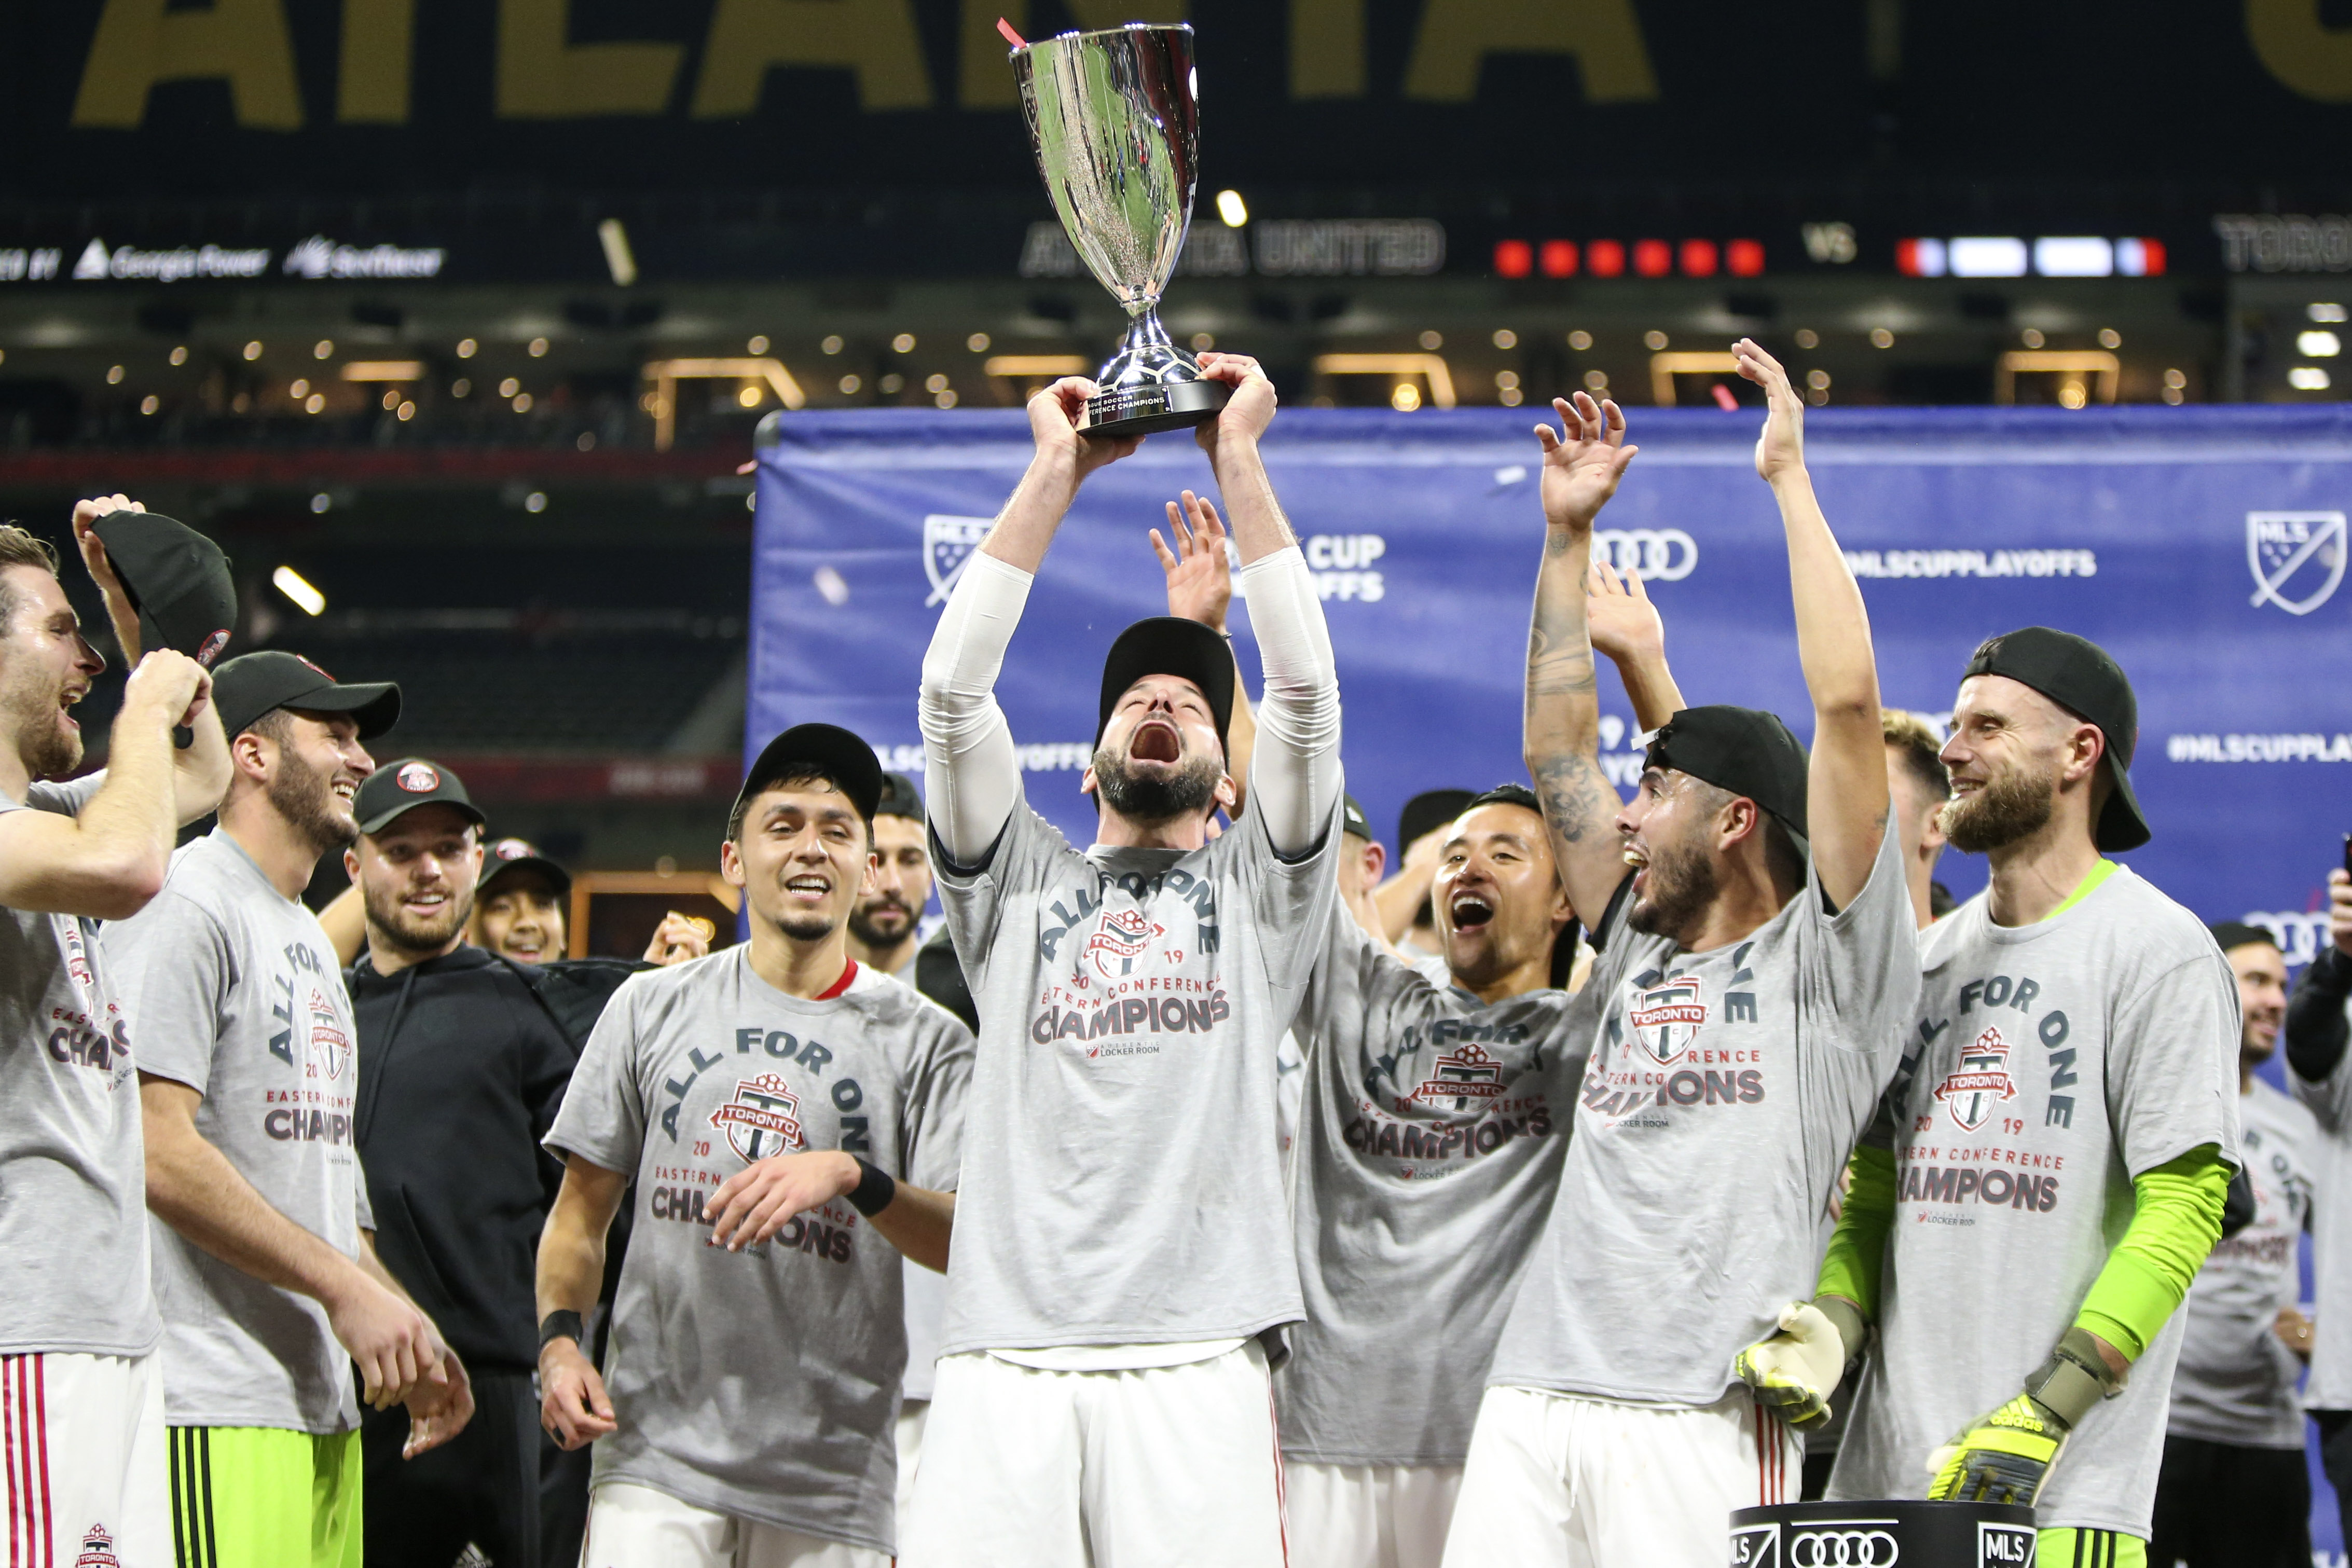 MLS:联盟杯决赛,多伦多FC在亚特兰大联队